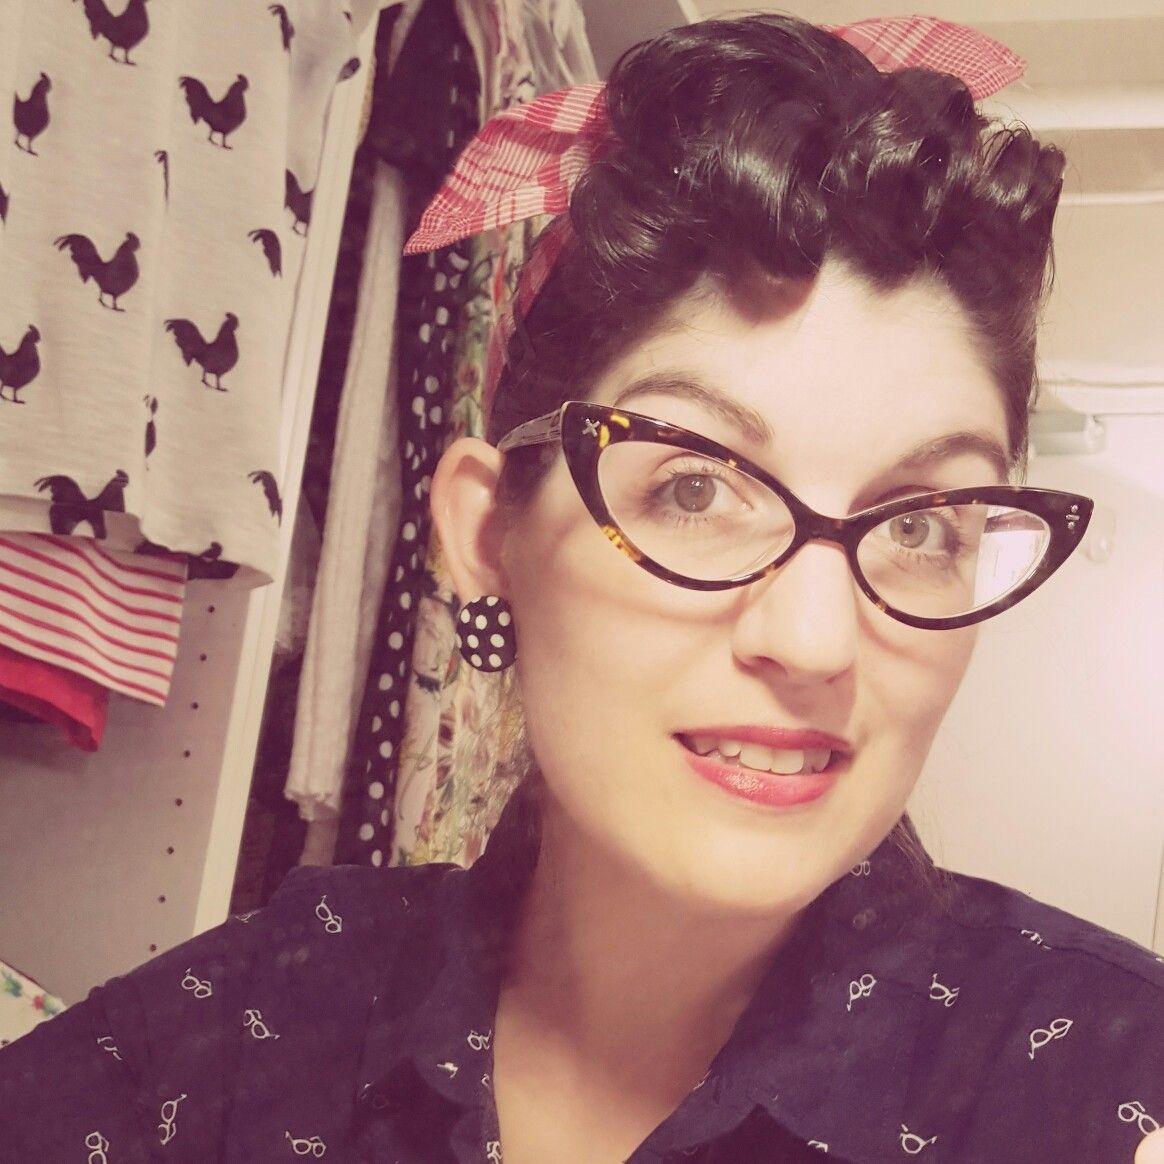 Rockabilly Pin Curl Bangs With Bandana. Cateye Glasses